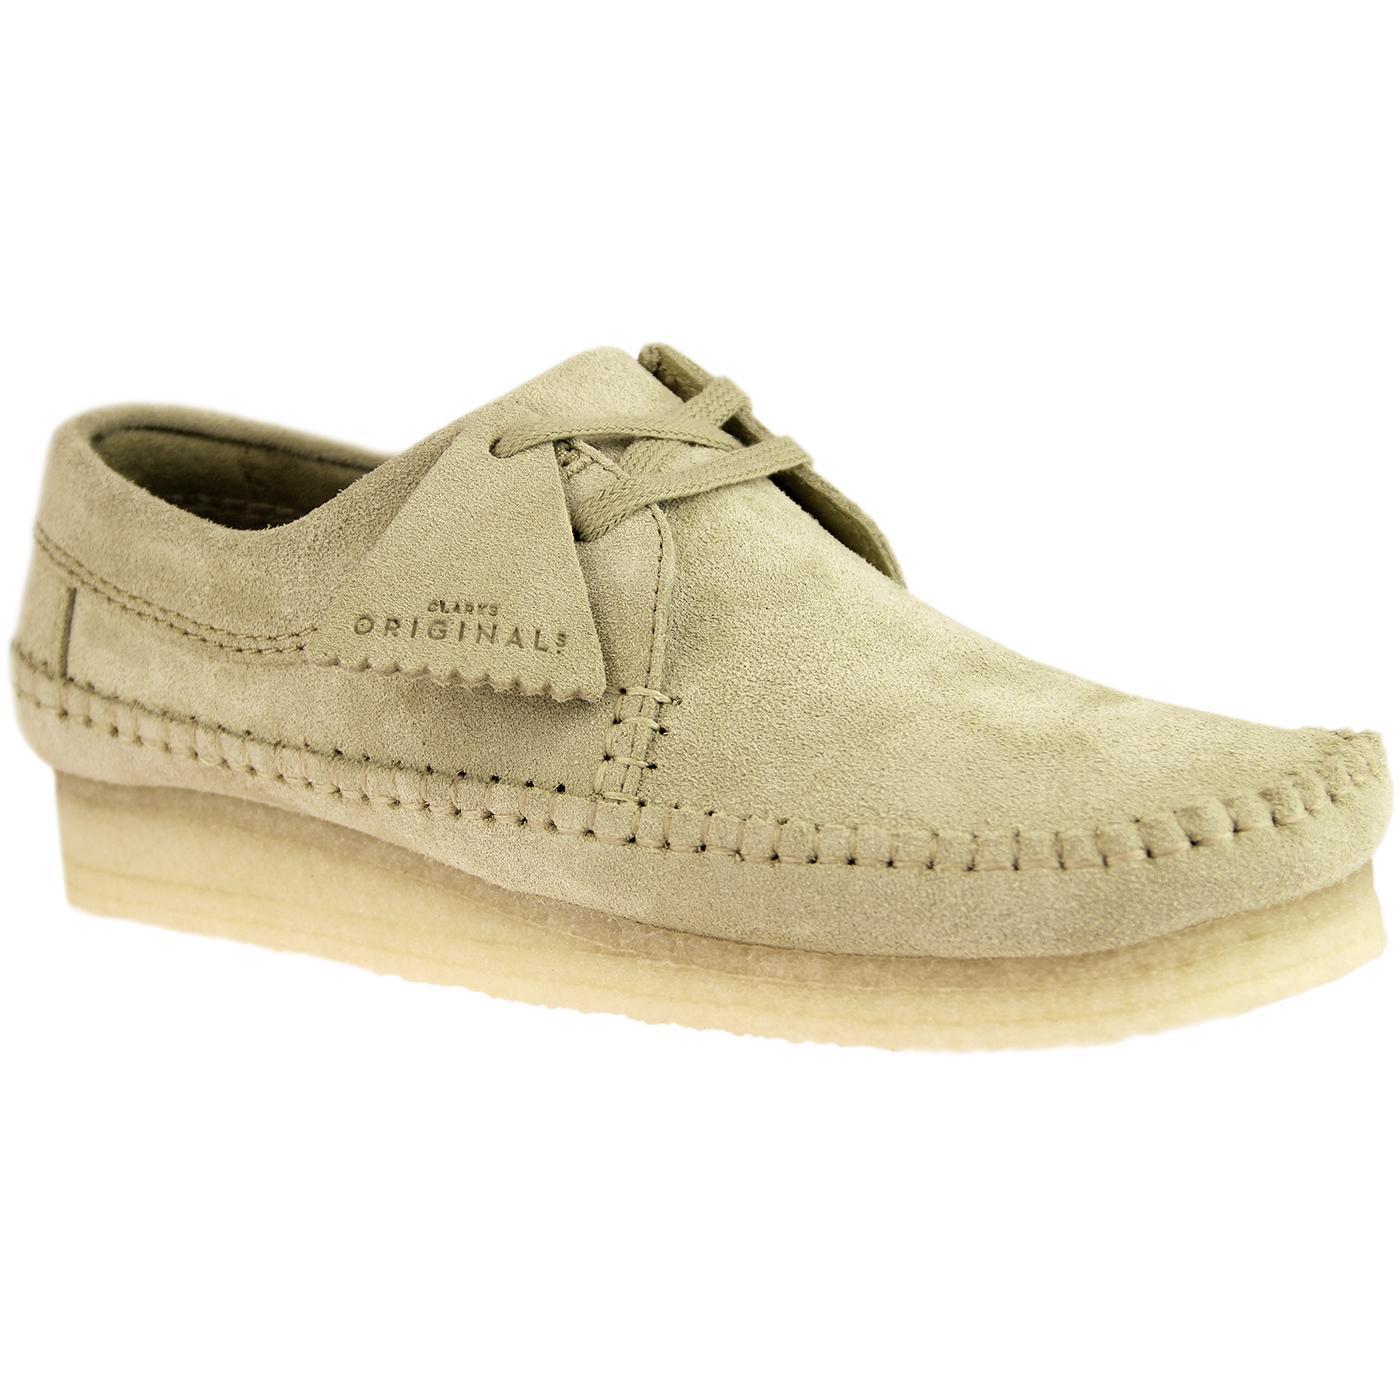 Weaver CLARKS ORIGINALS Suede Moccasin Shoes MAPLE